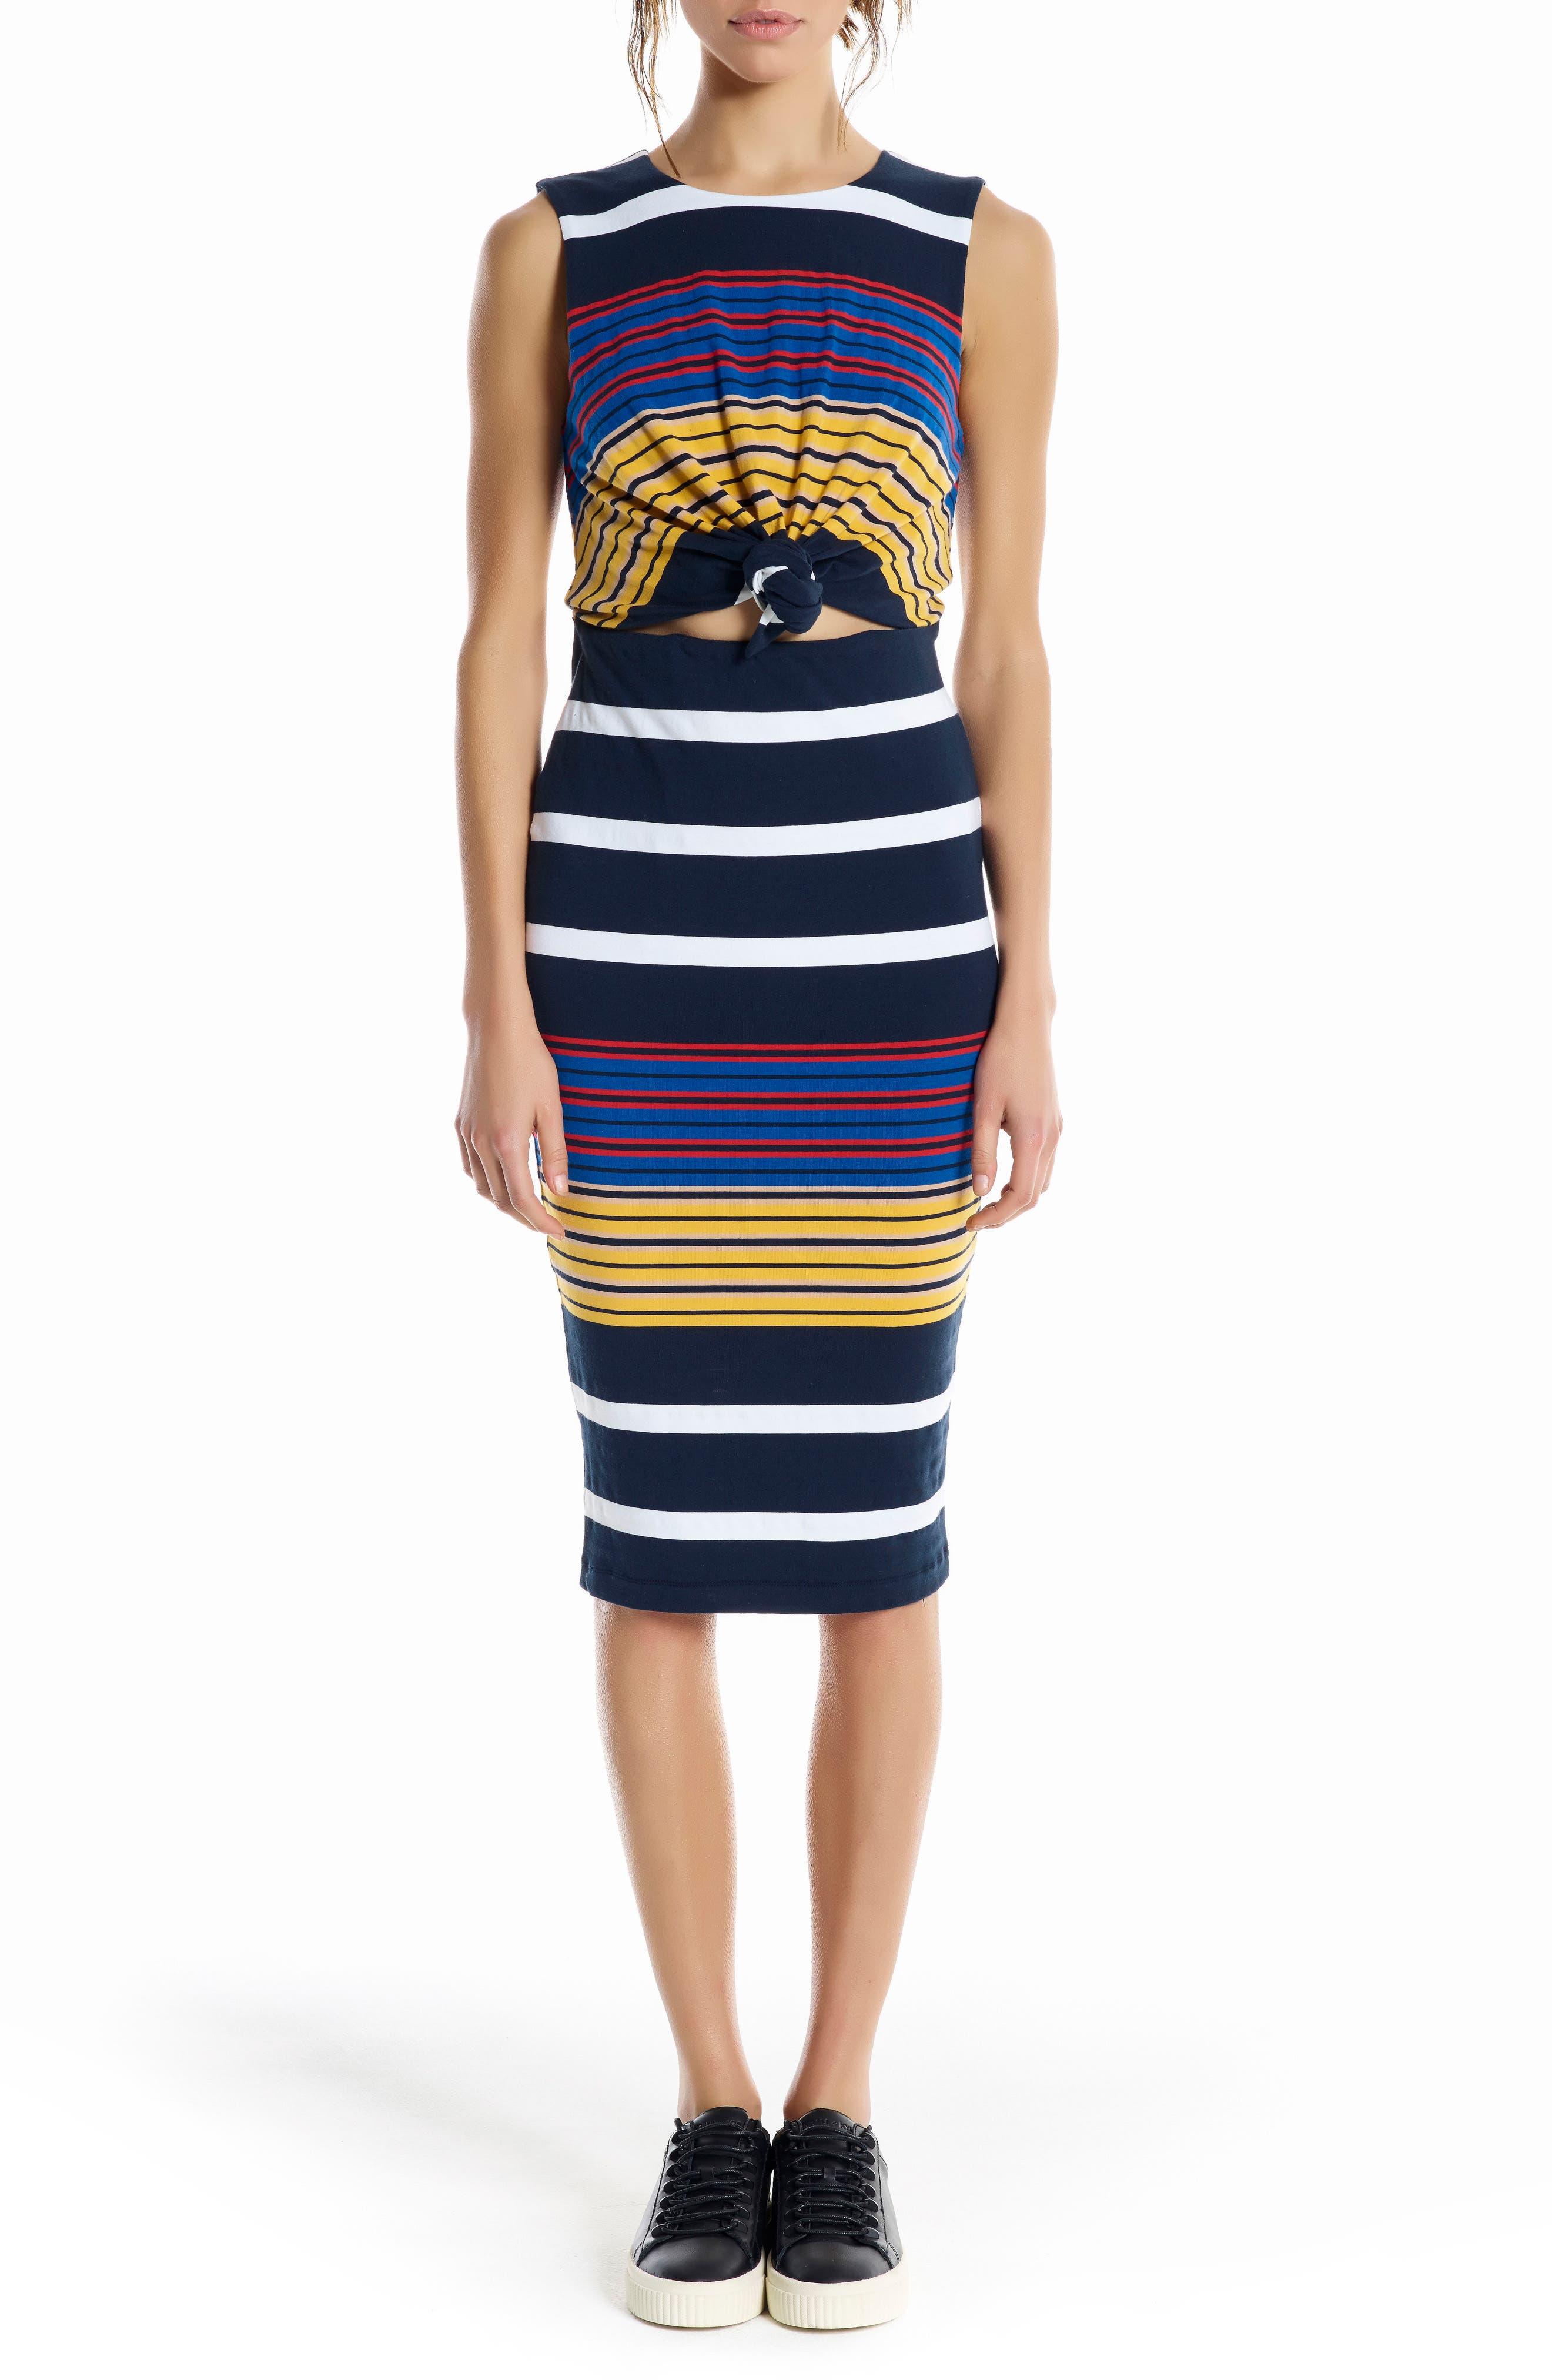 KENDELL + KYLIE Stripe Midi Dress,                             Main thumbnail 1, color,                             001